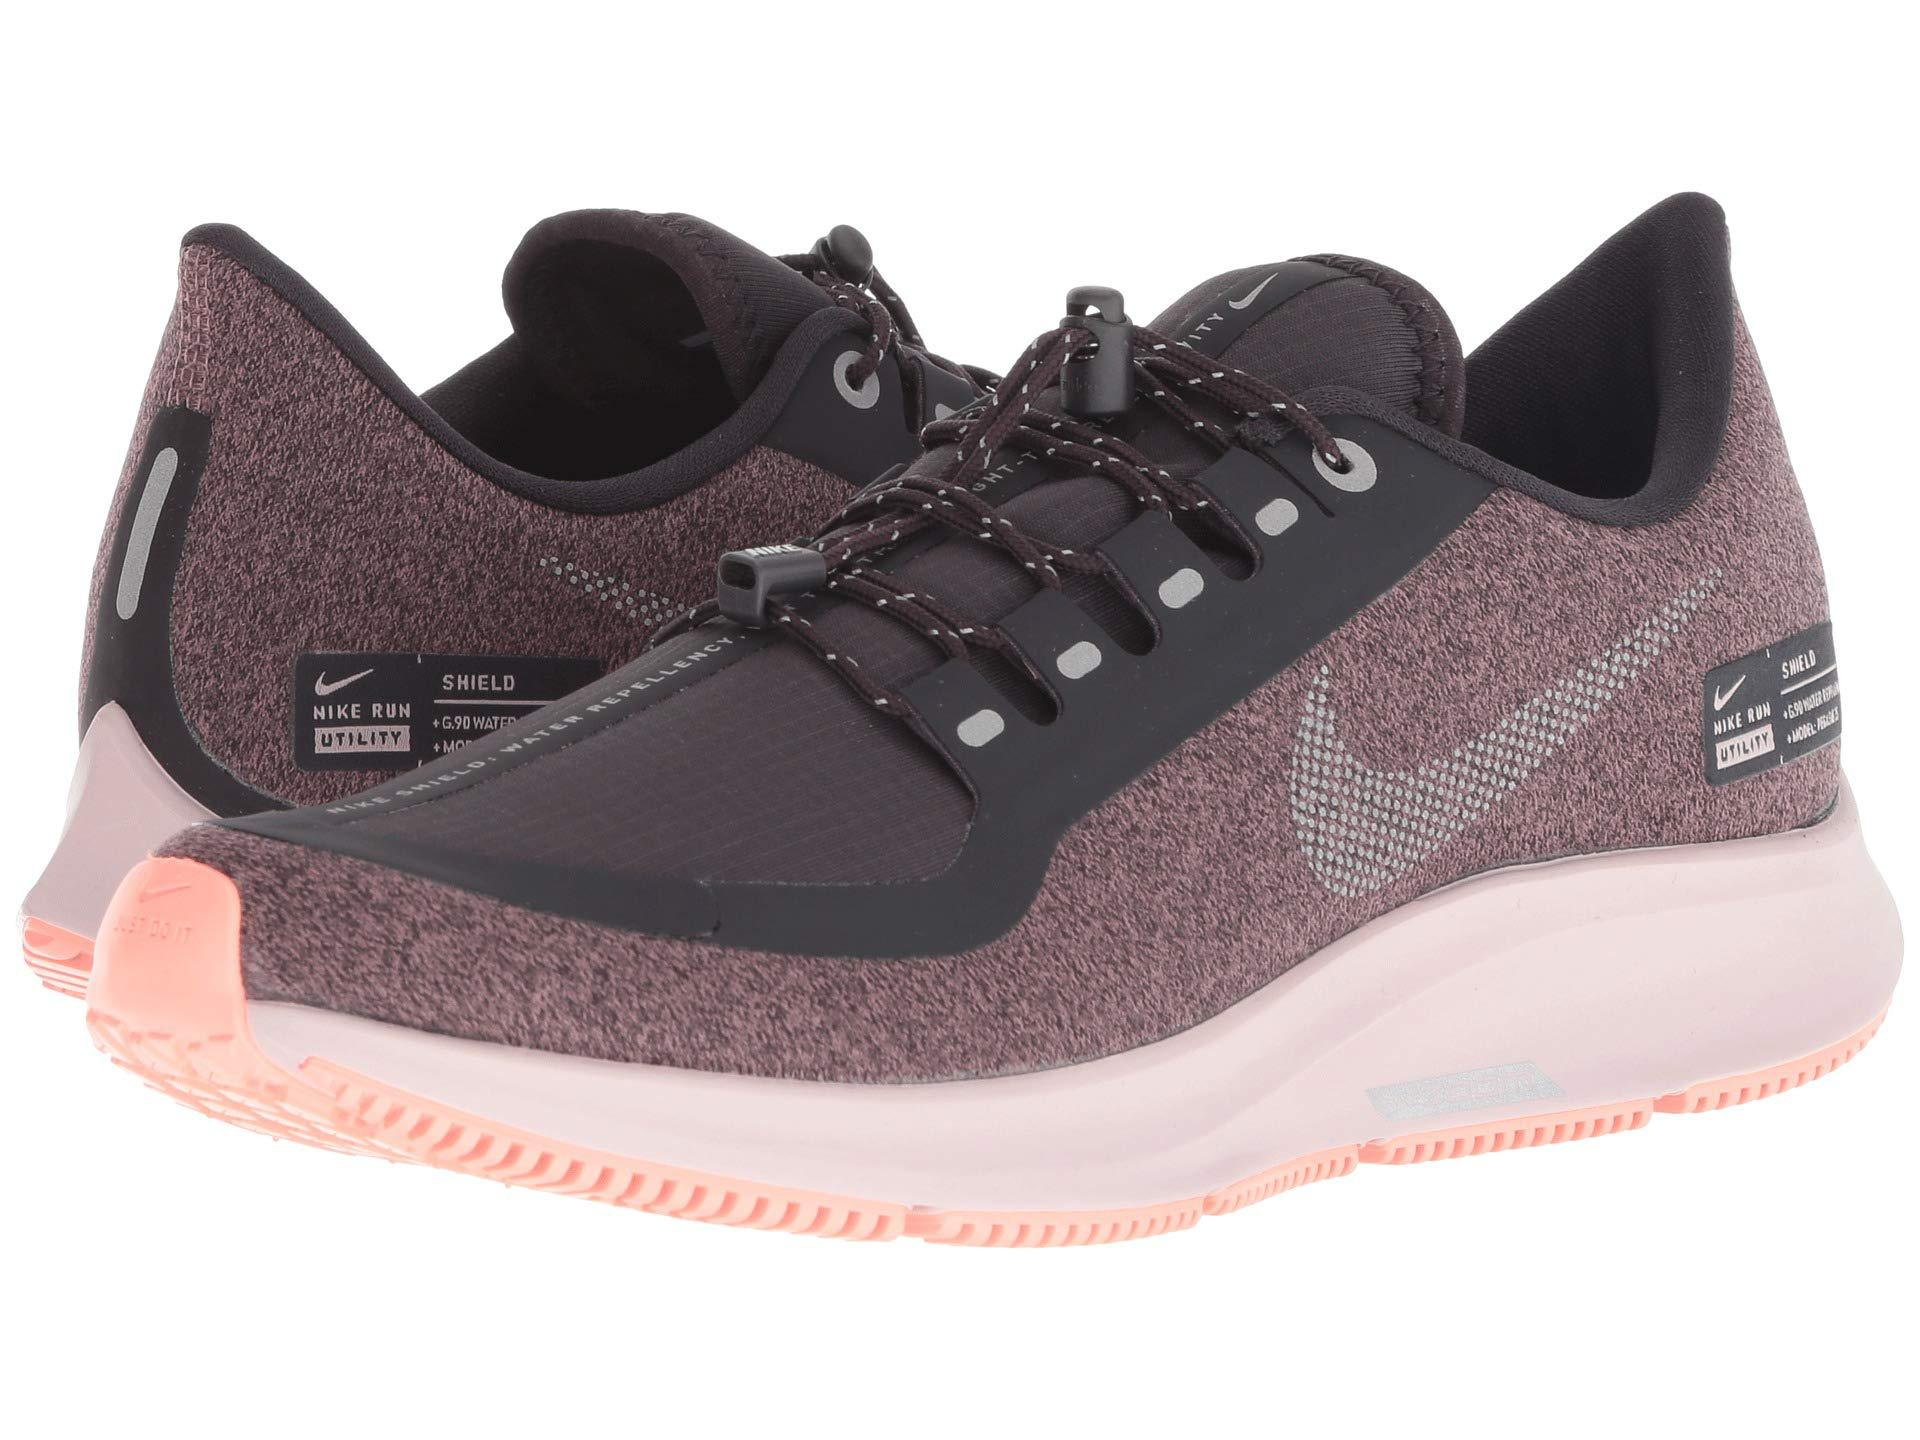 3a7a3793e831 Nike. Air Zoom Pegasus 35 Shield (oil Grey metallic Silver smokey Mauve) Women s  Running Shoes